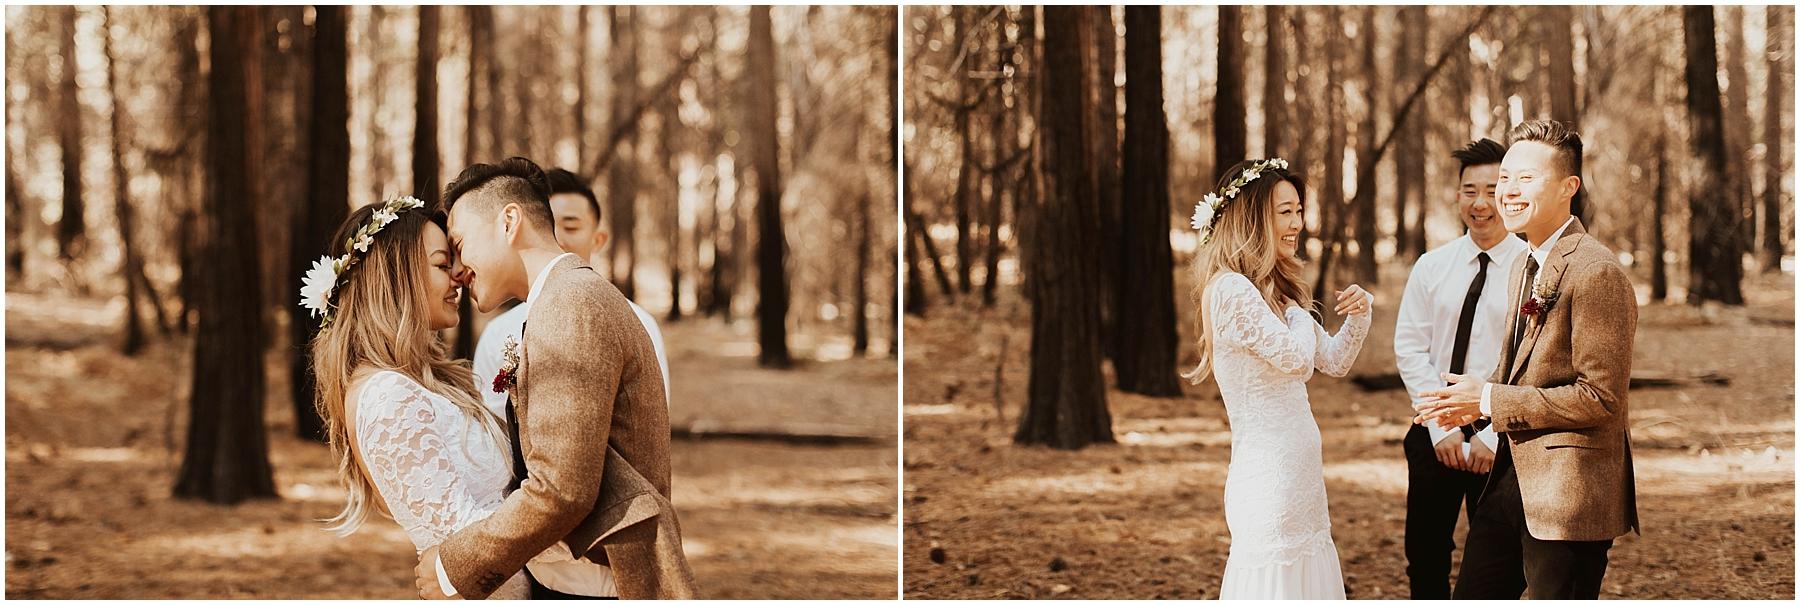 Yosemite_elopement_0049.jpg